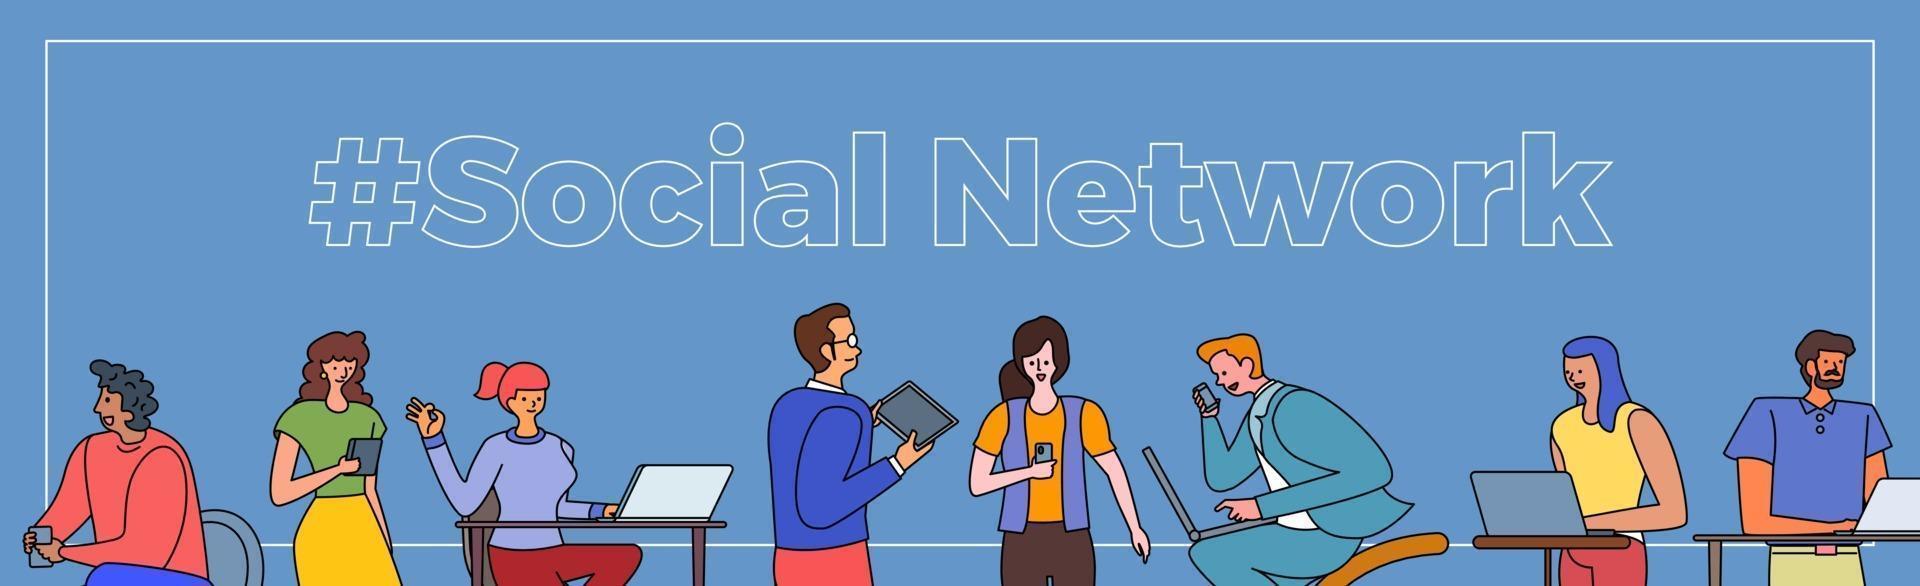 Social Network People vector